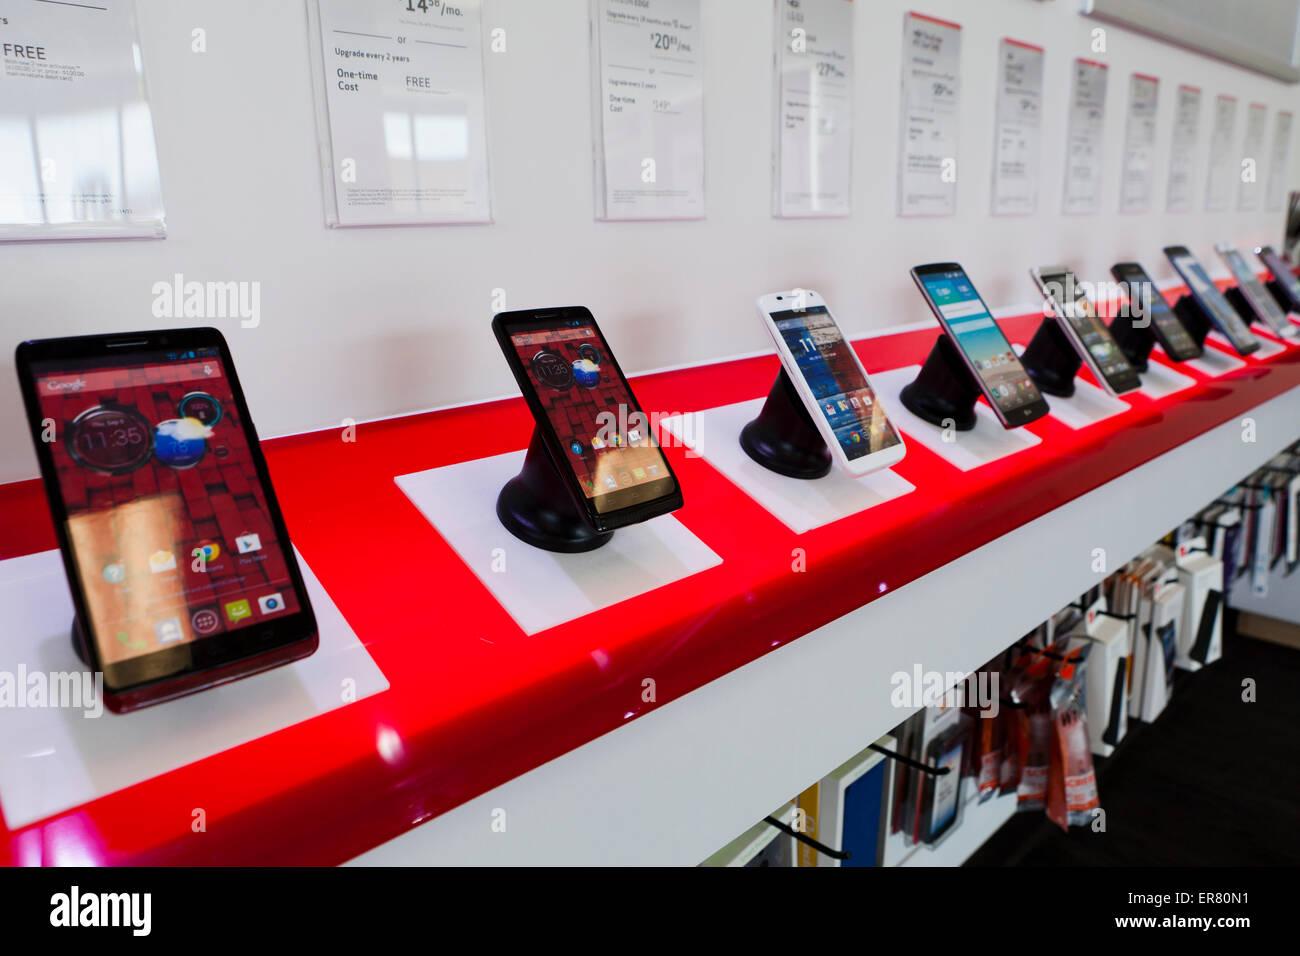 Mobile pads and phones on display at Verizon store - USA Stock Photo